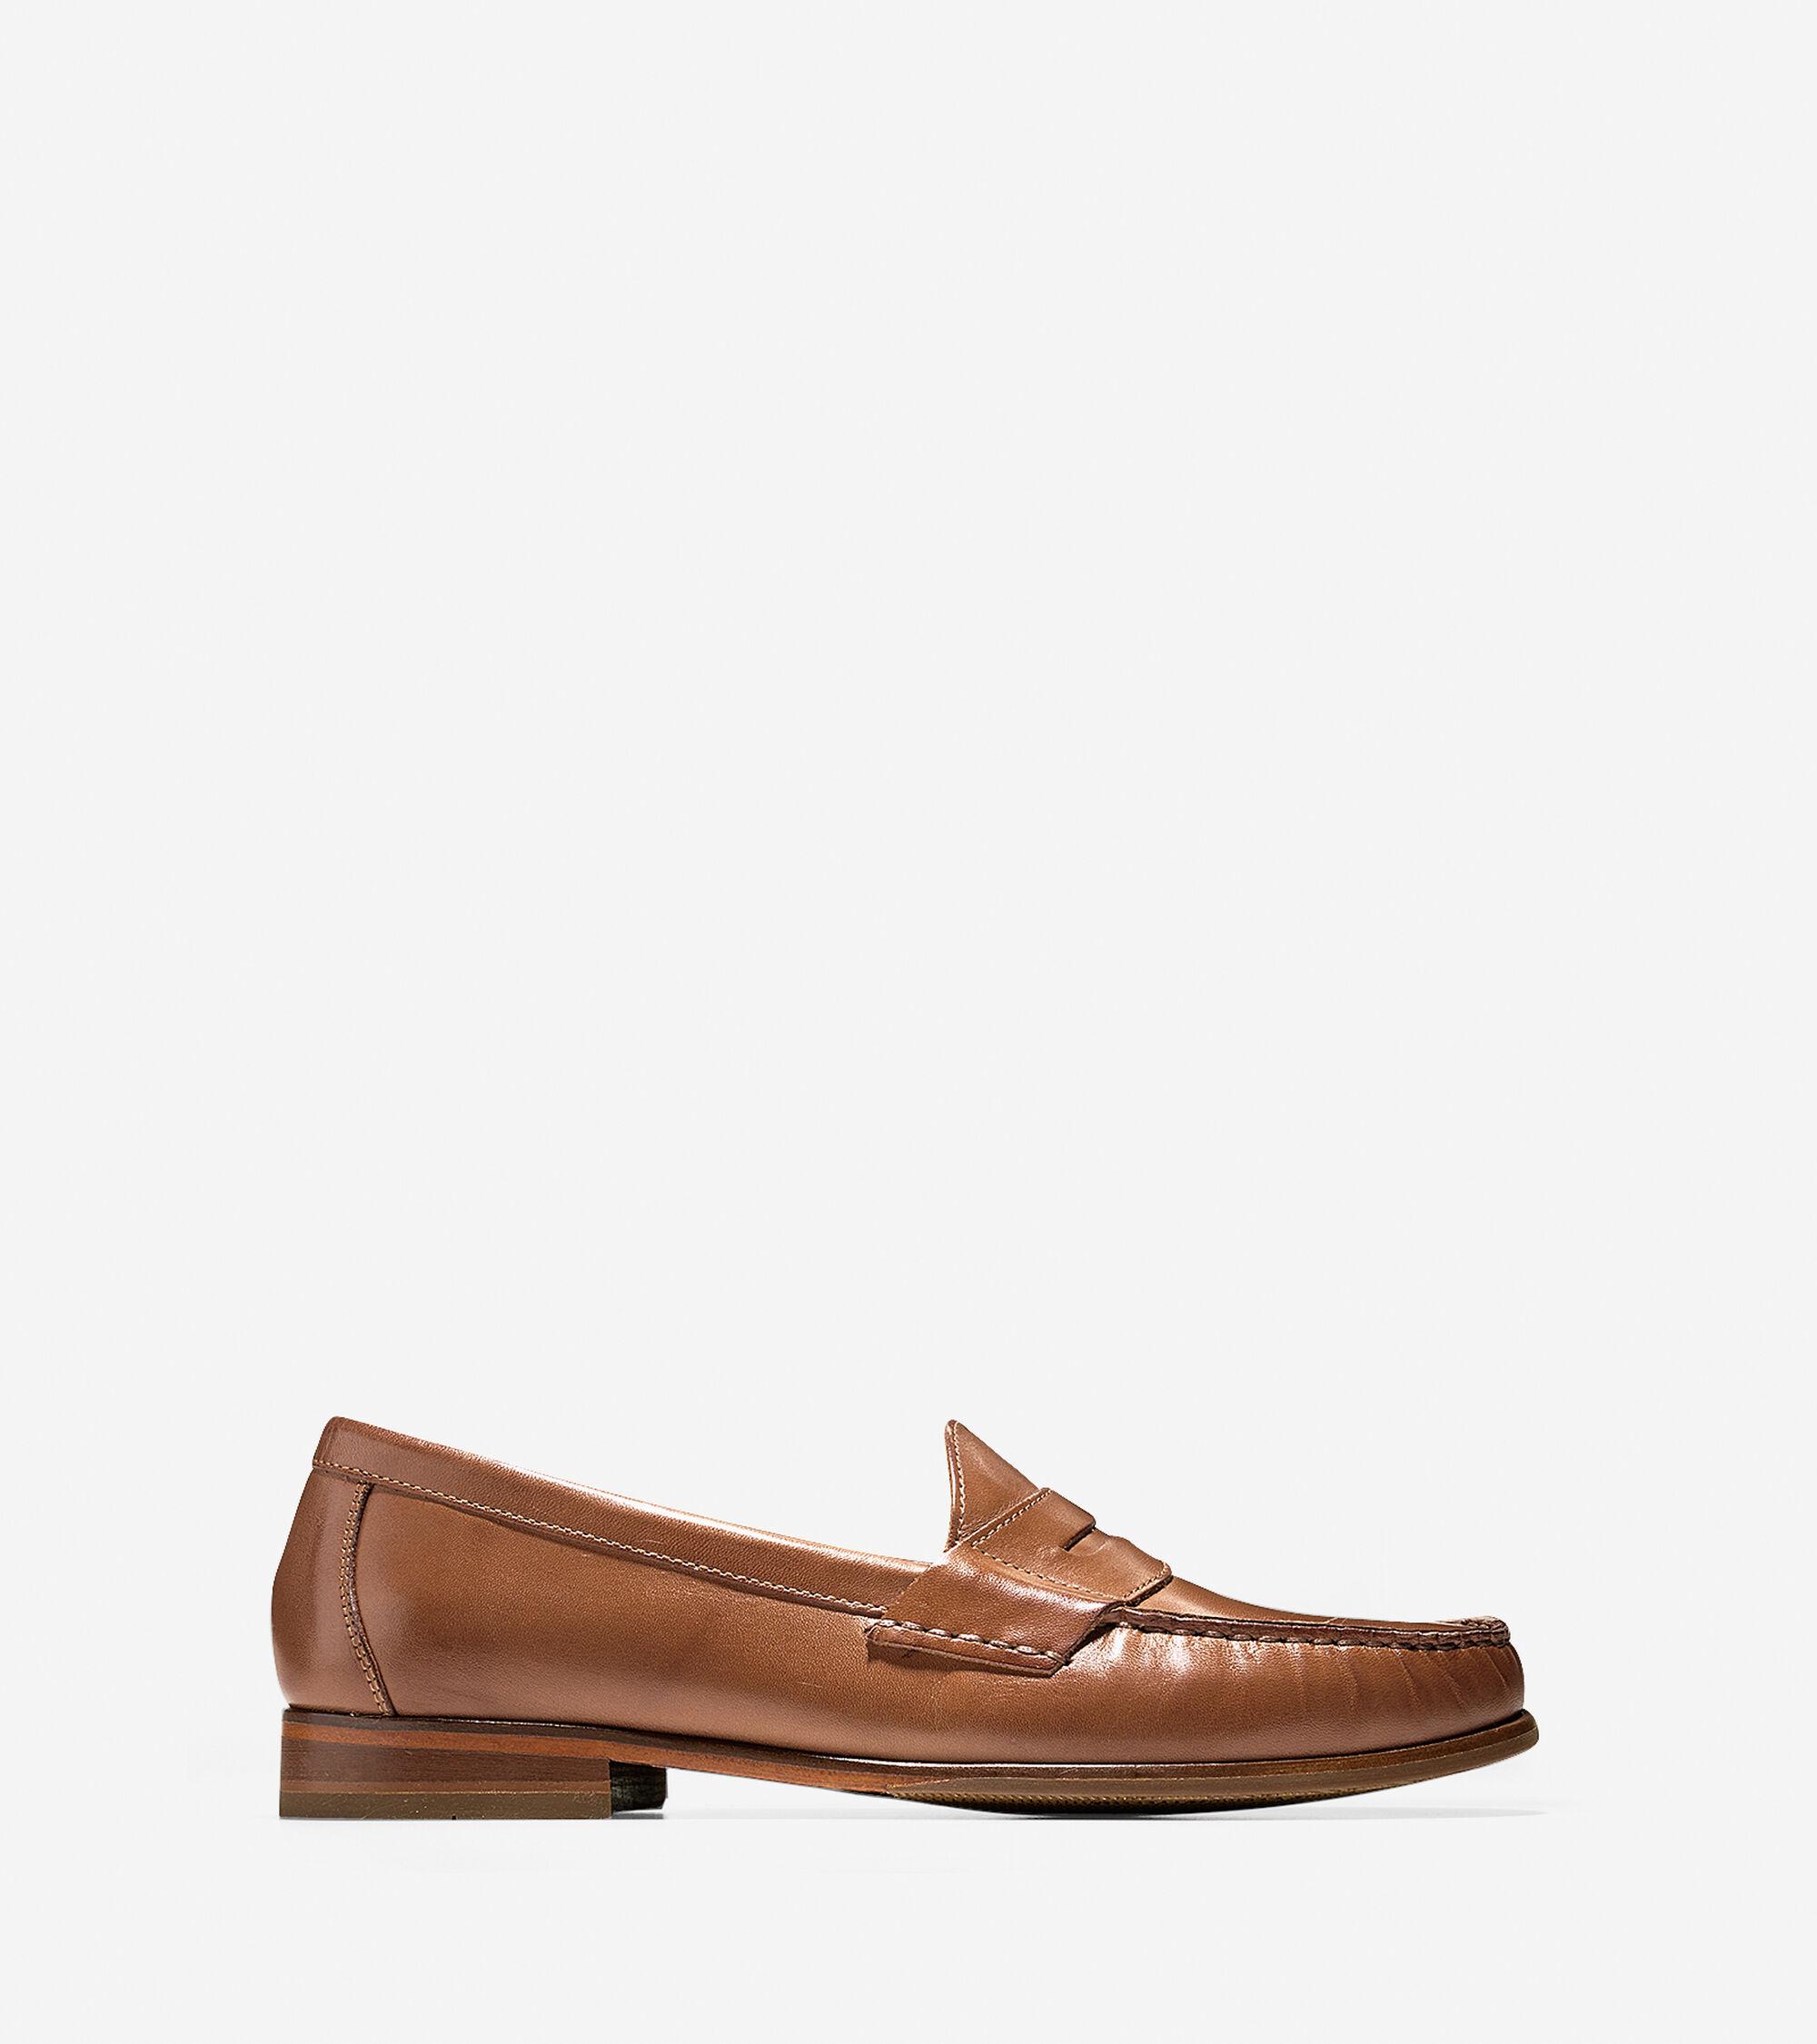 b1d62cf7dd0 Men s Ascot Penny Loafers   Sale